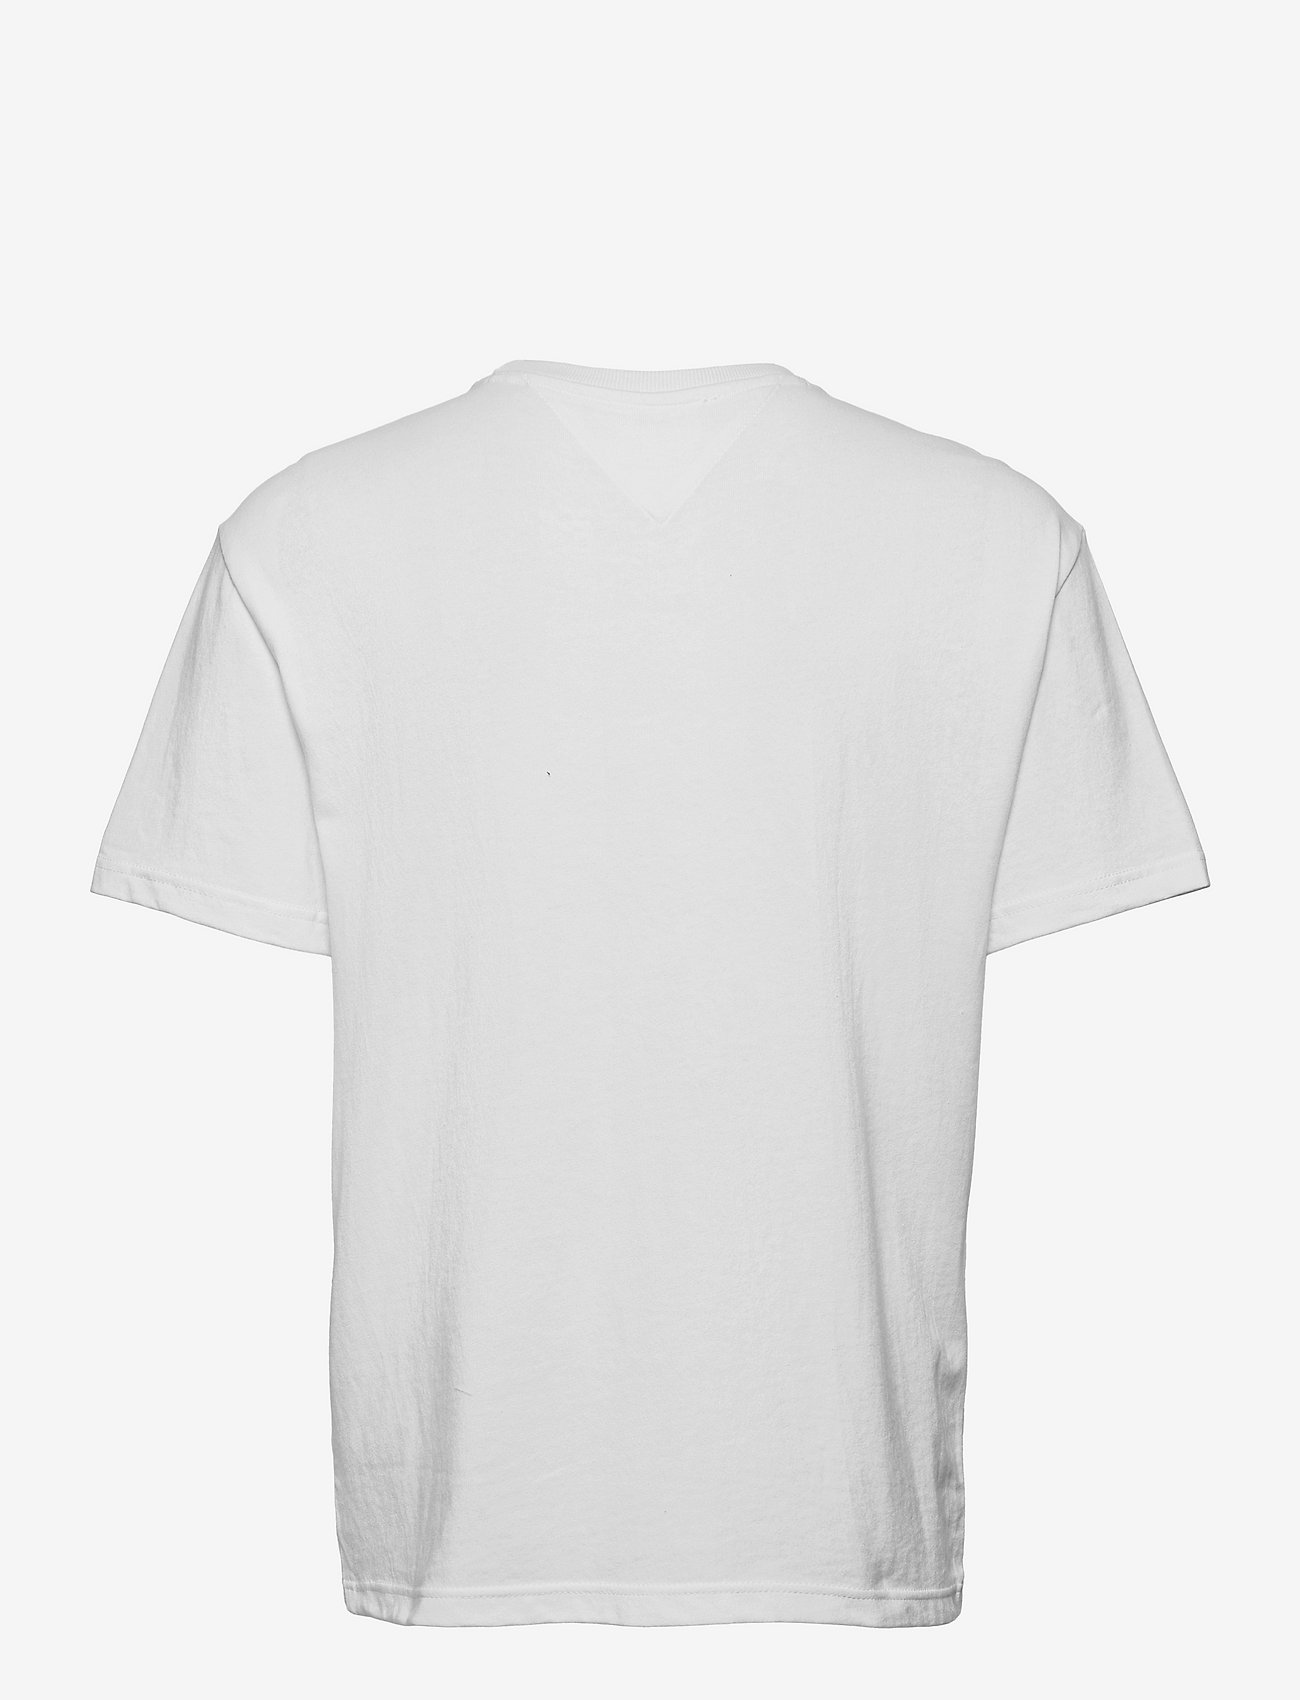 Tommy Jeans - TJM TONAL FLAG TEE - kortärmade t-shirts - white - 1